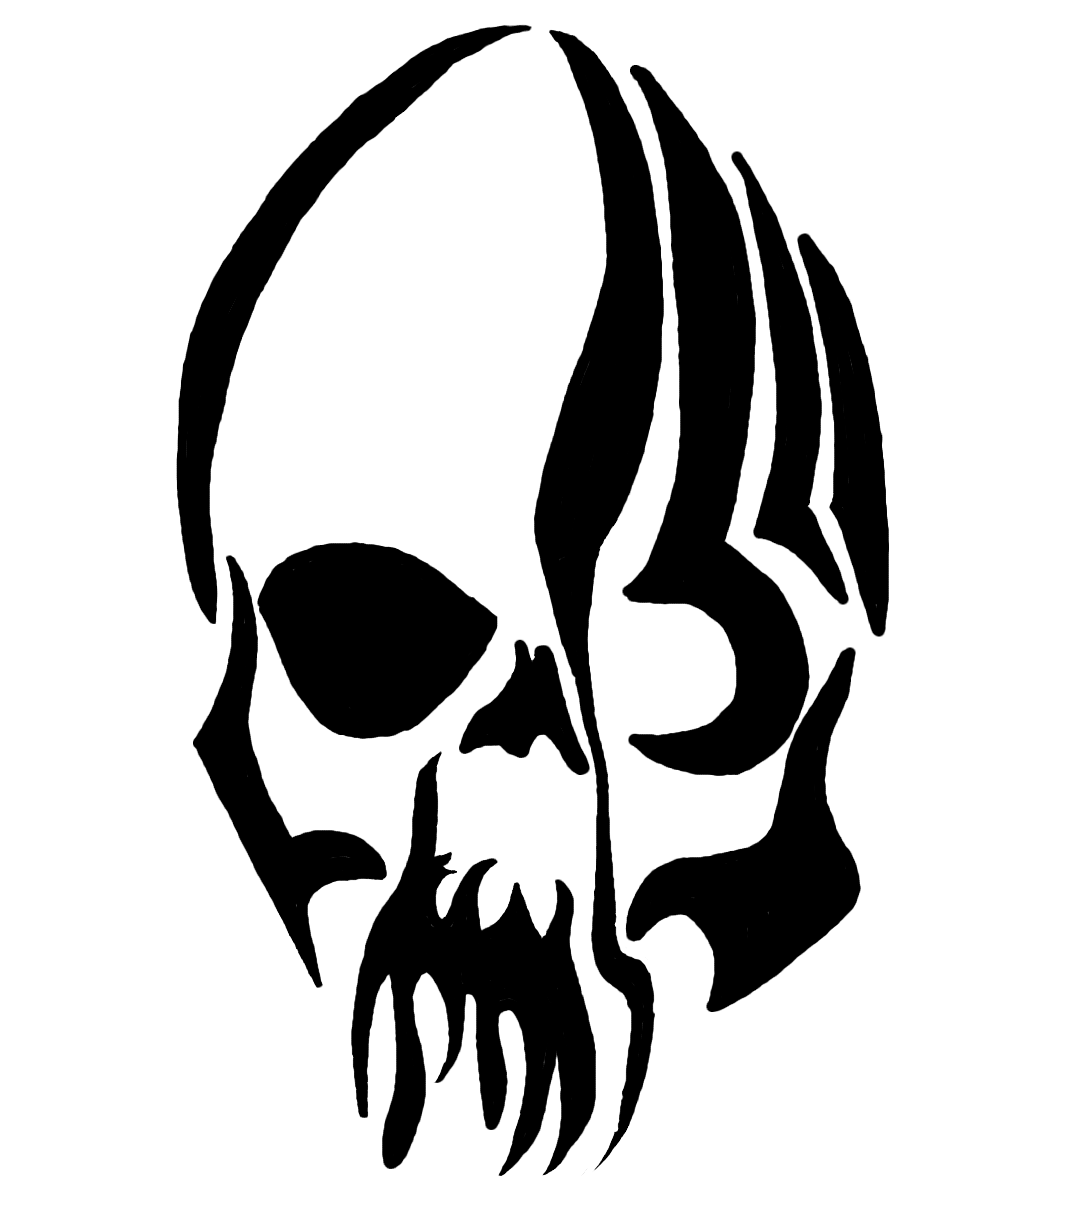 Tribal Skull Tattoos Png Image #19371 - Tribal Skull Tattoos, Transparent background PNG HD thumbnail